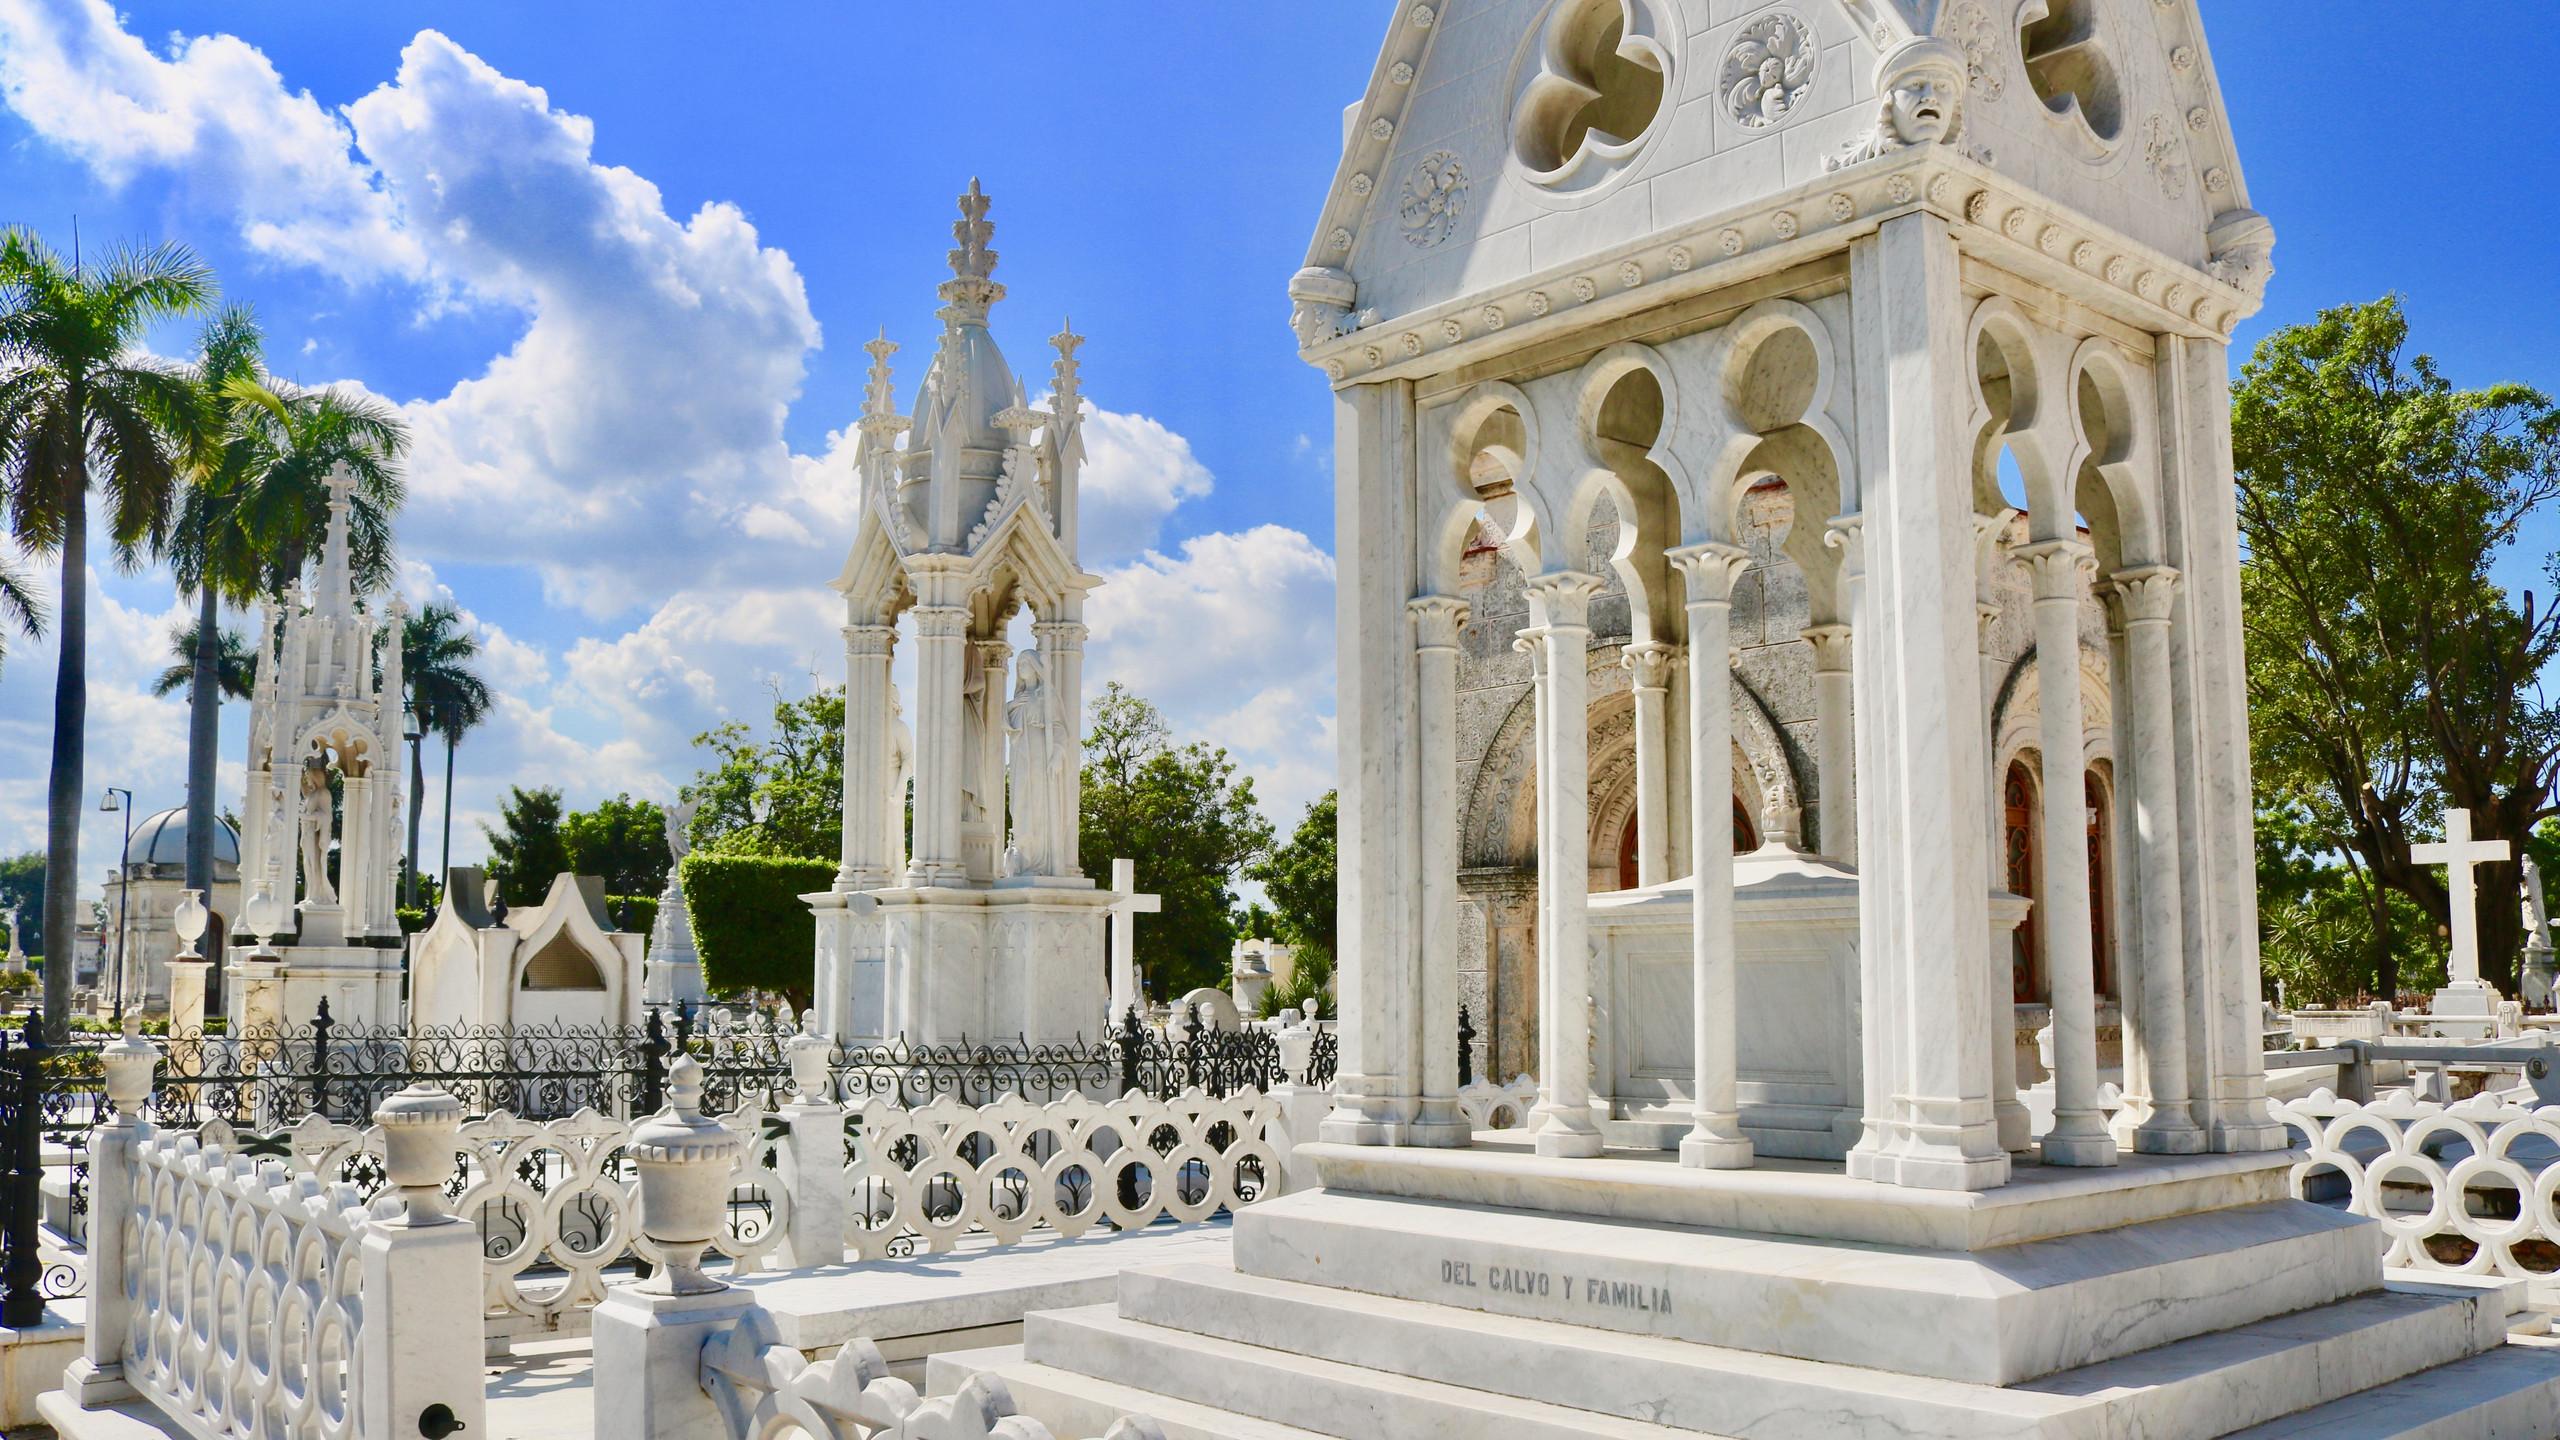 White mausoleums in Havana's Colon Cemetery.